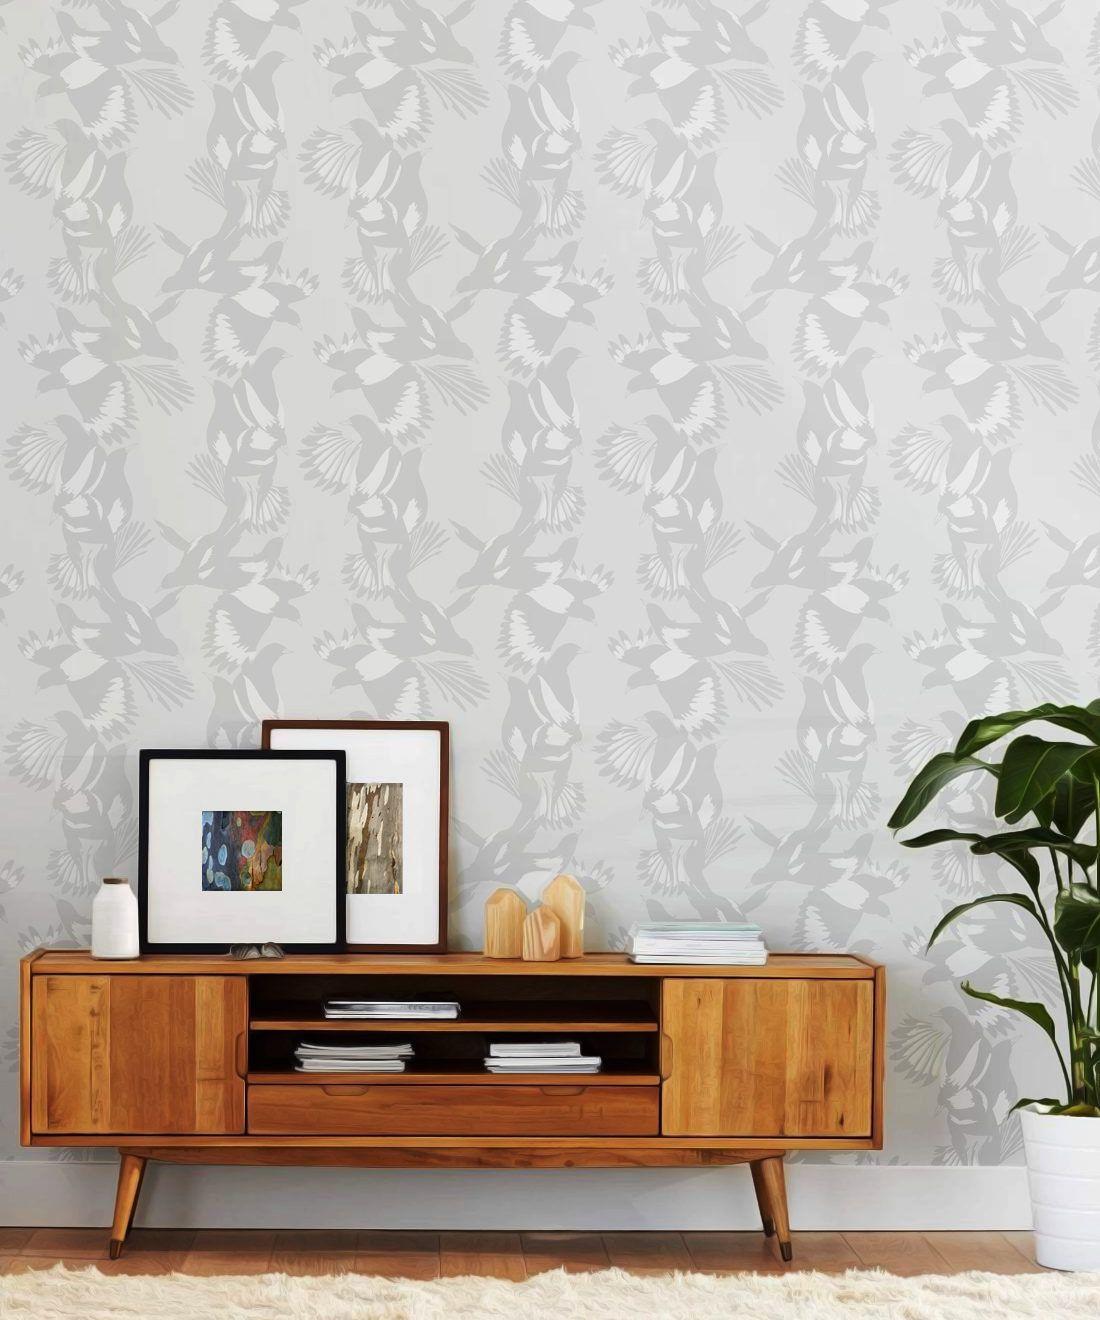 Magpie Wallpaper • Milton & King • Kingdom Home • Bird Wallpaper • Bondi Grey Insitu